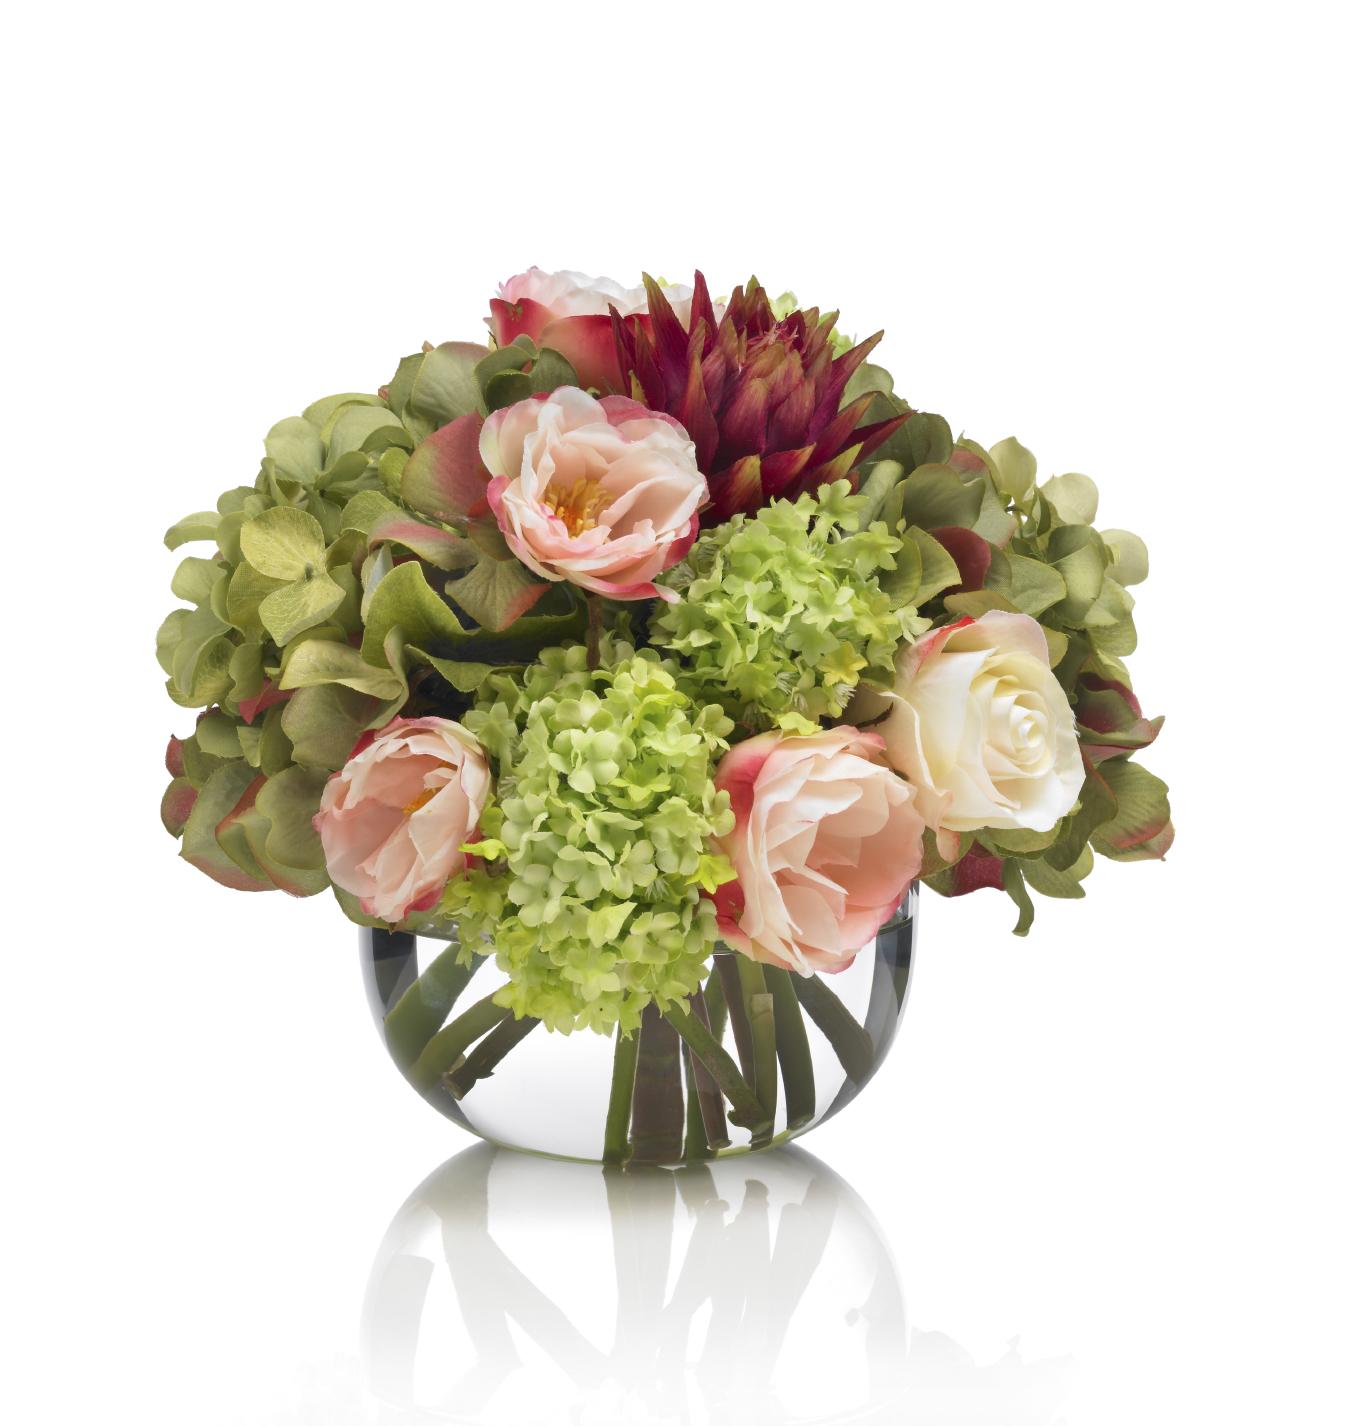 flower arrangement istock.jpg